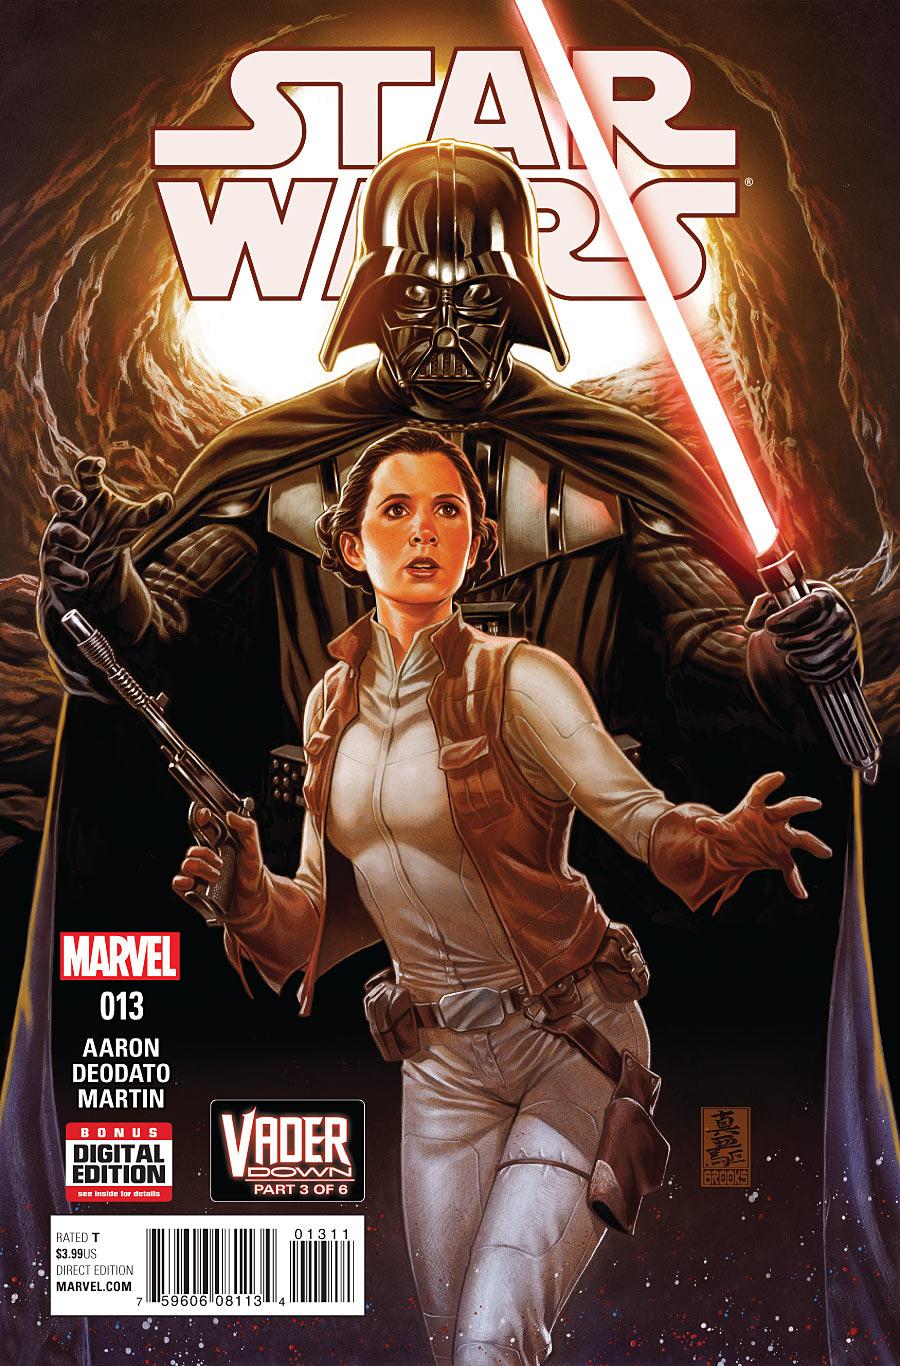 Star Wars 13 - Book III, Part III : Vader Down